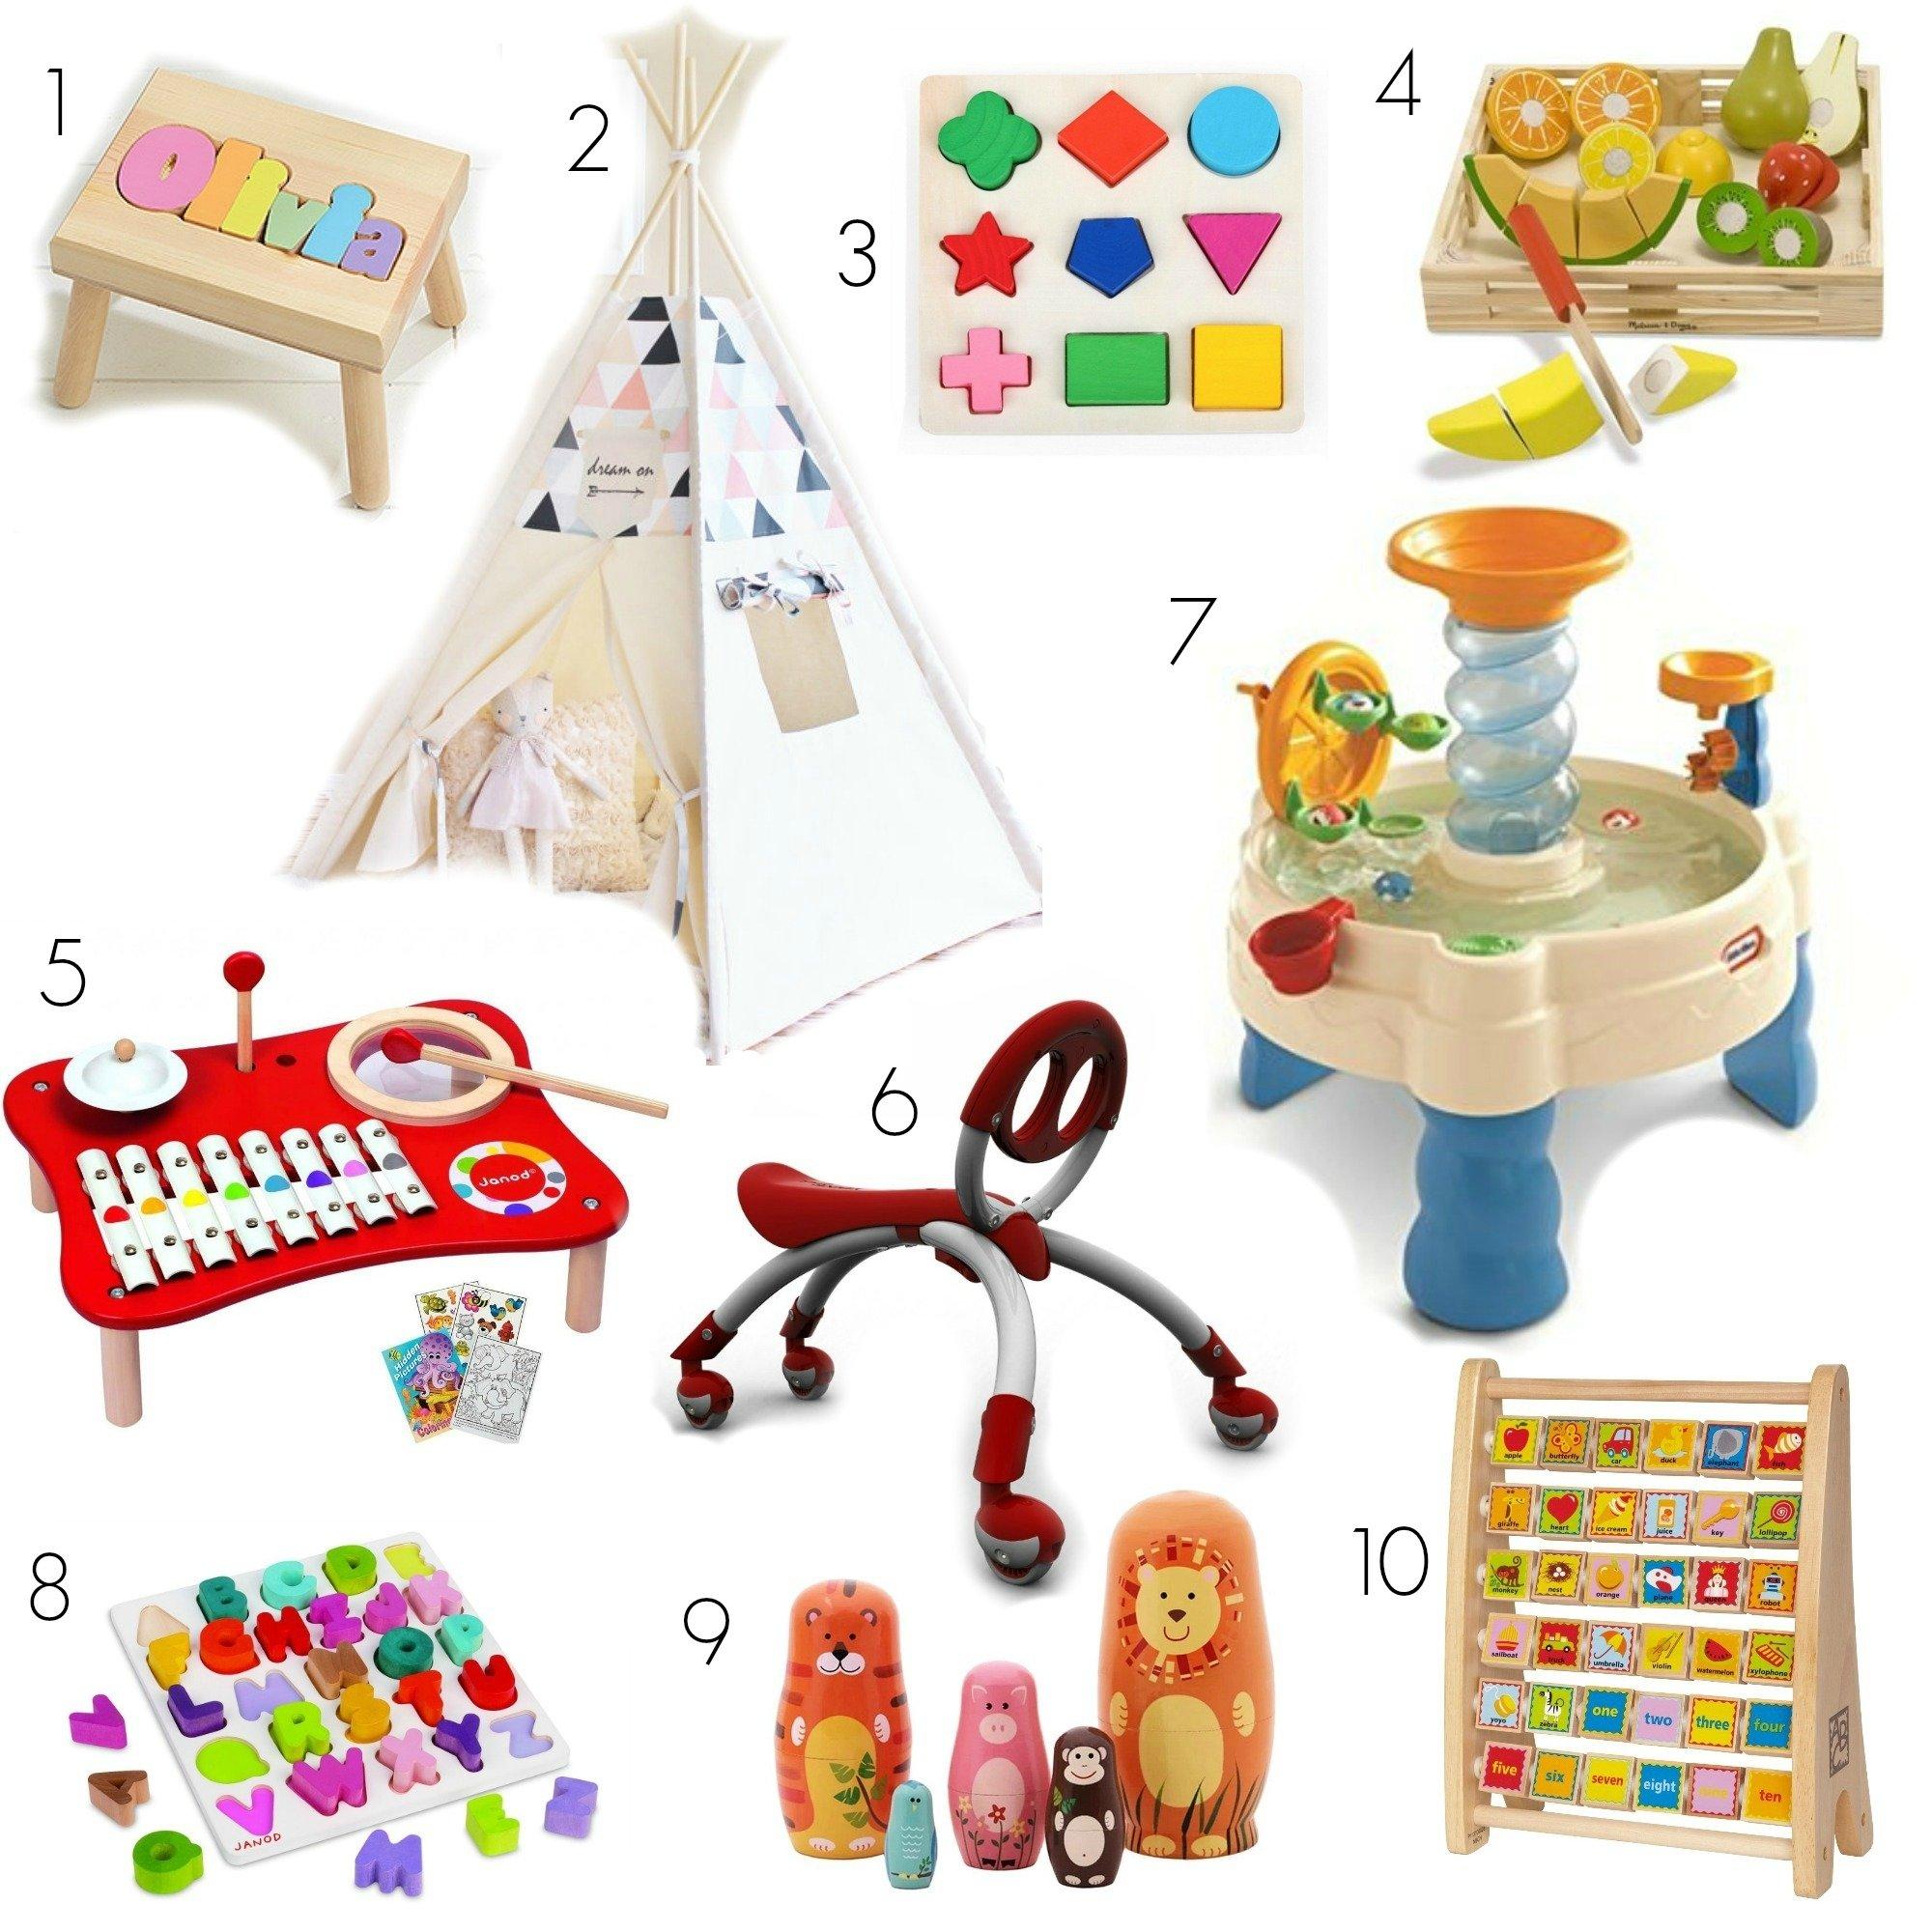 10 Wonderful Baby 1St Birthday Gift Ideas its a one derful life first birthday gift ideas my plot of sunshine 2020